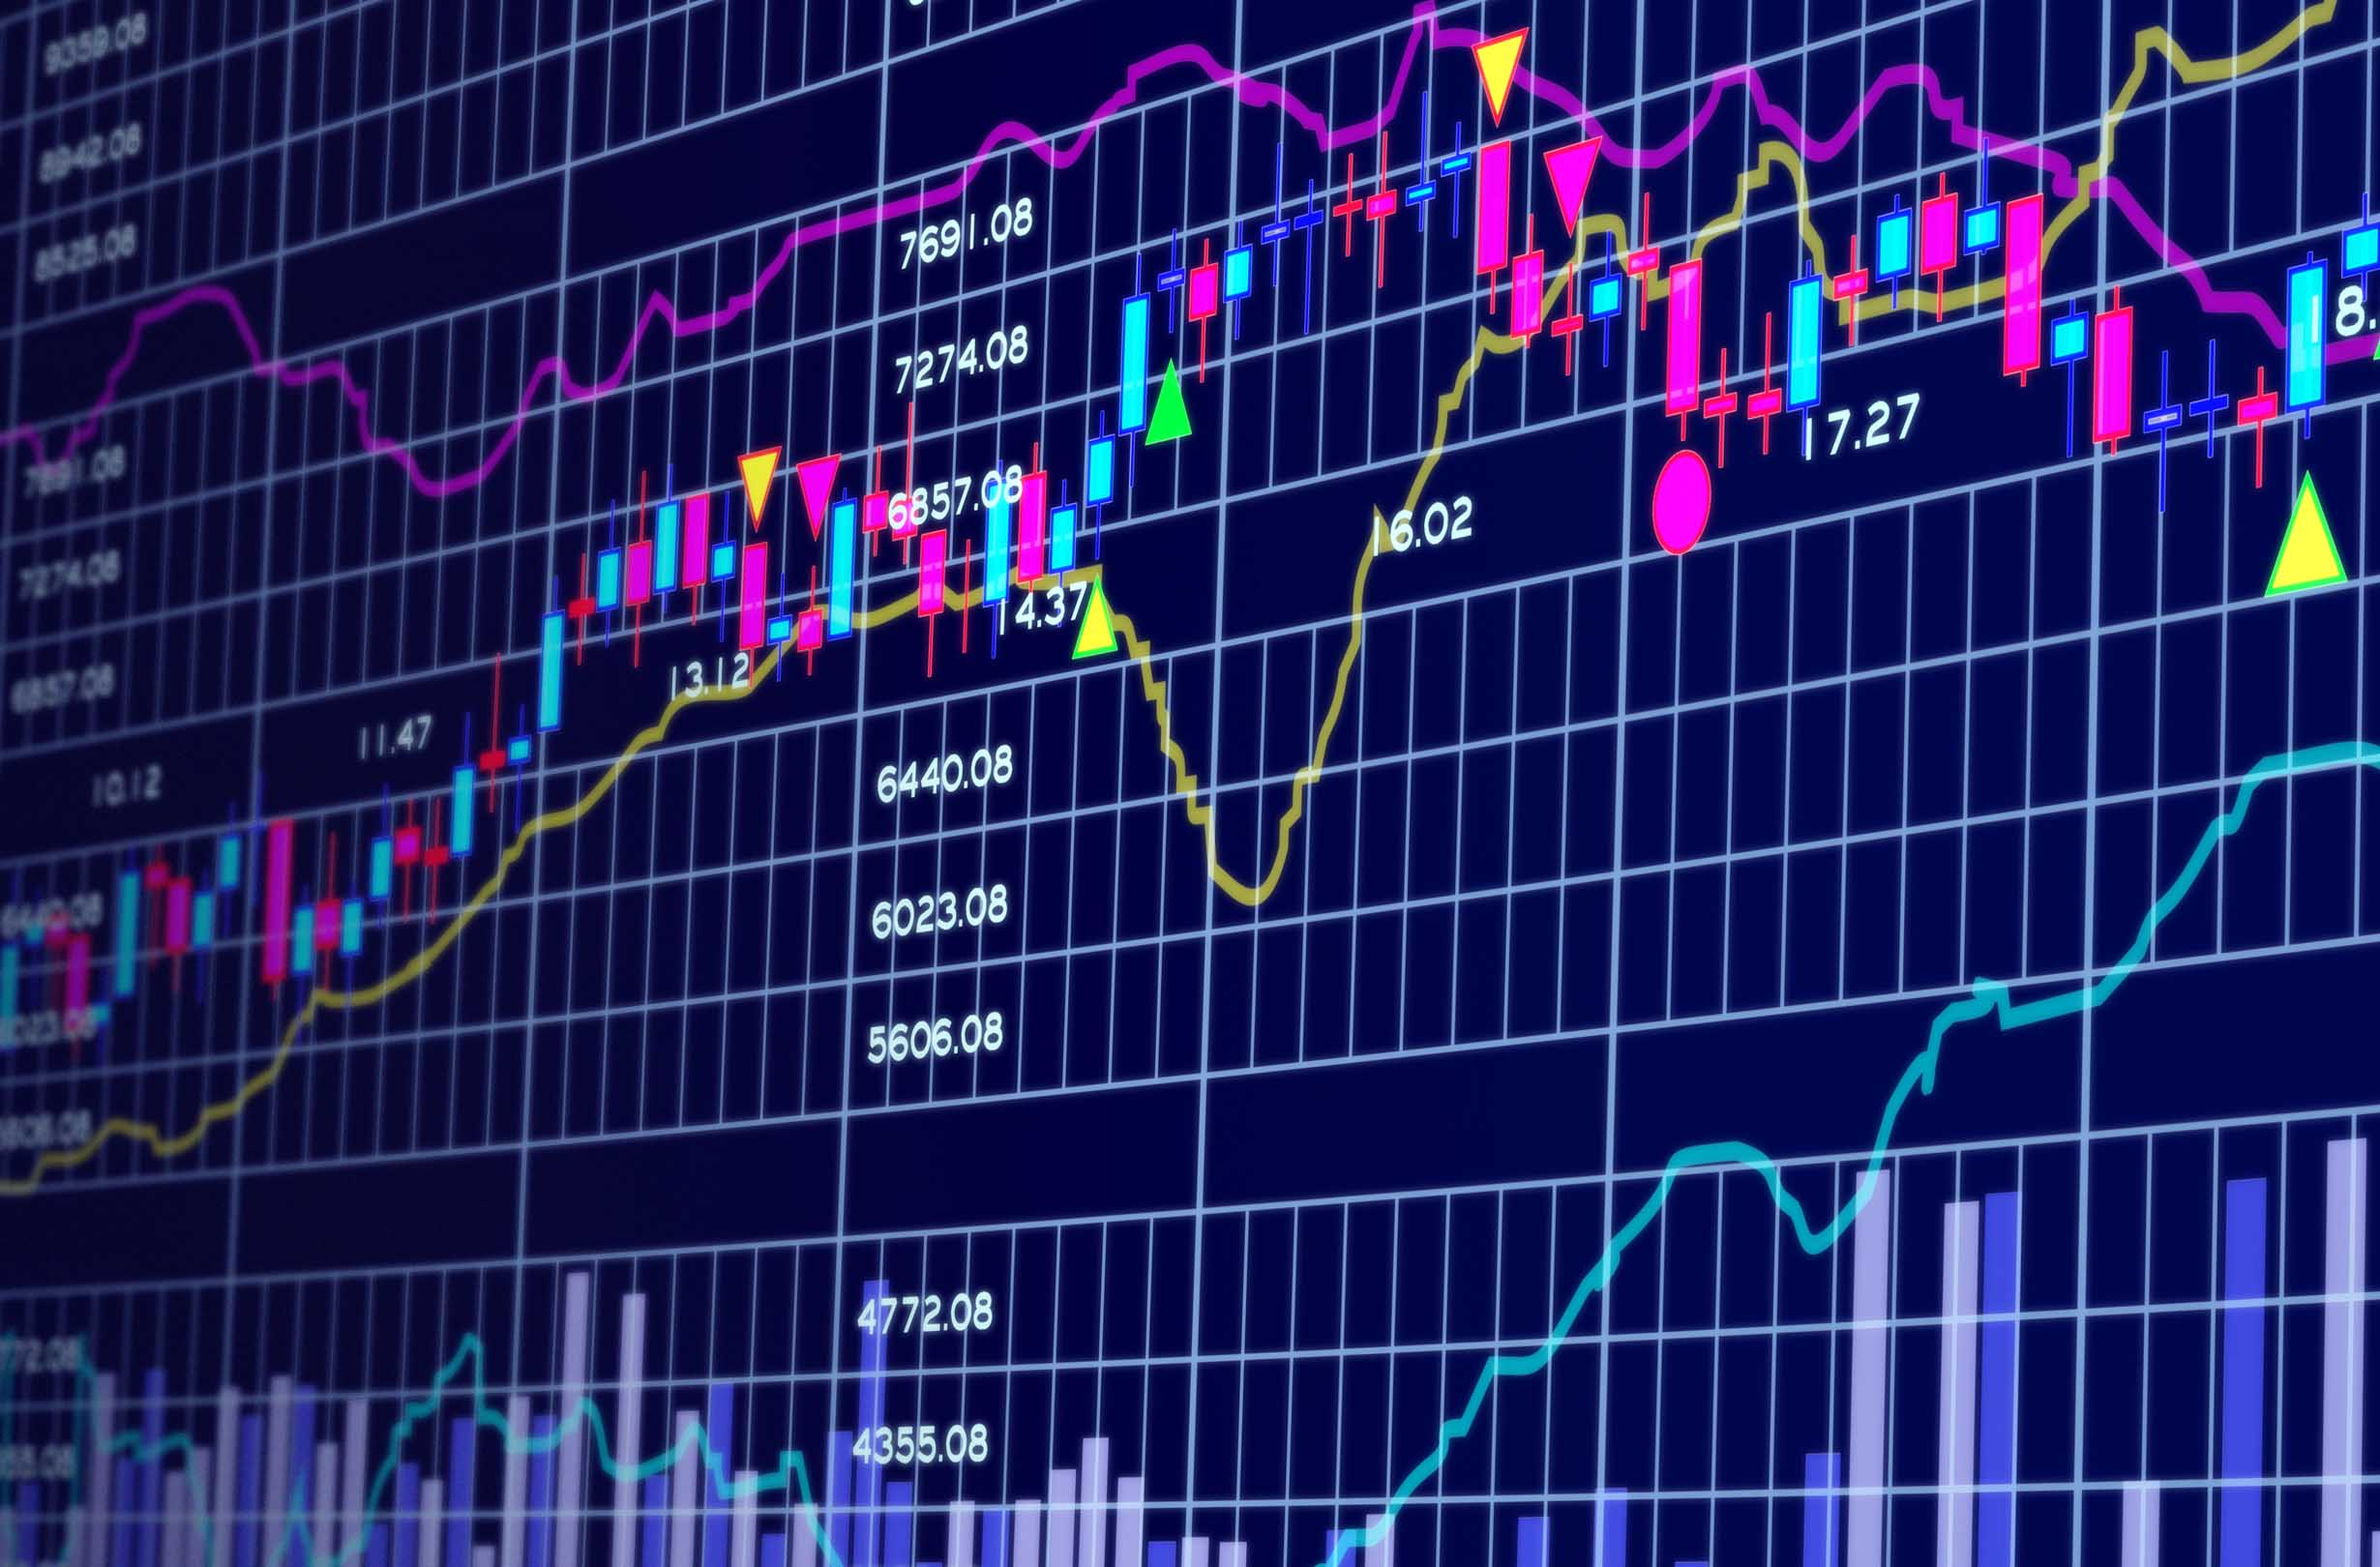 Alba forex trading palermo